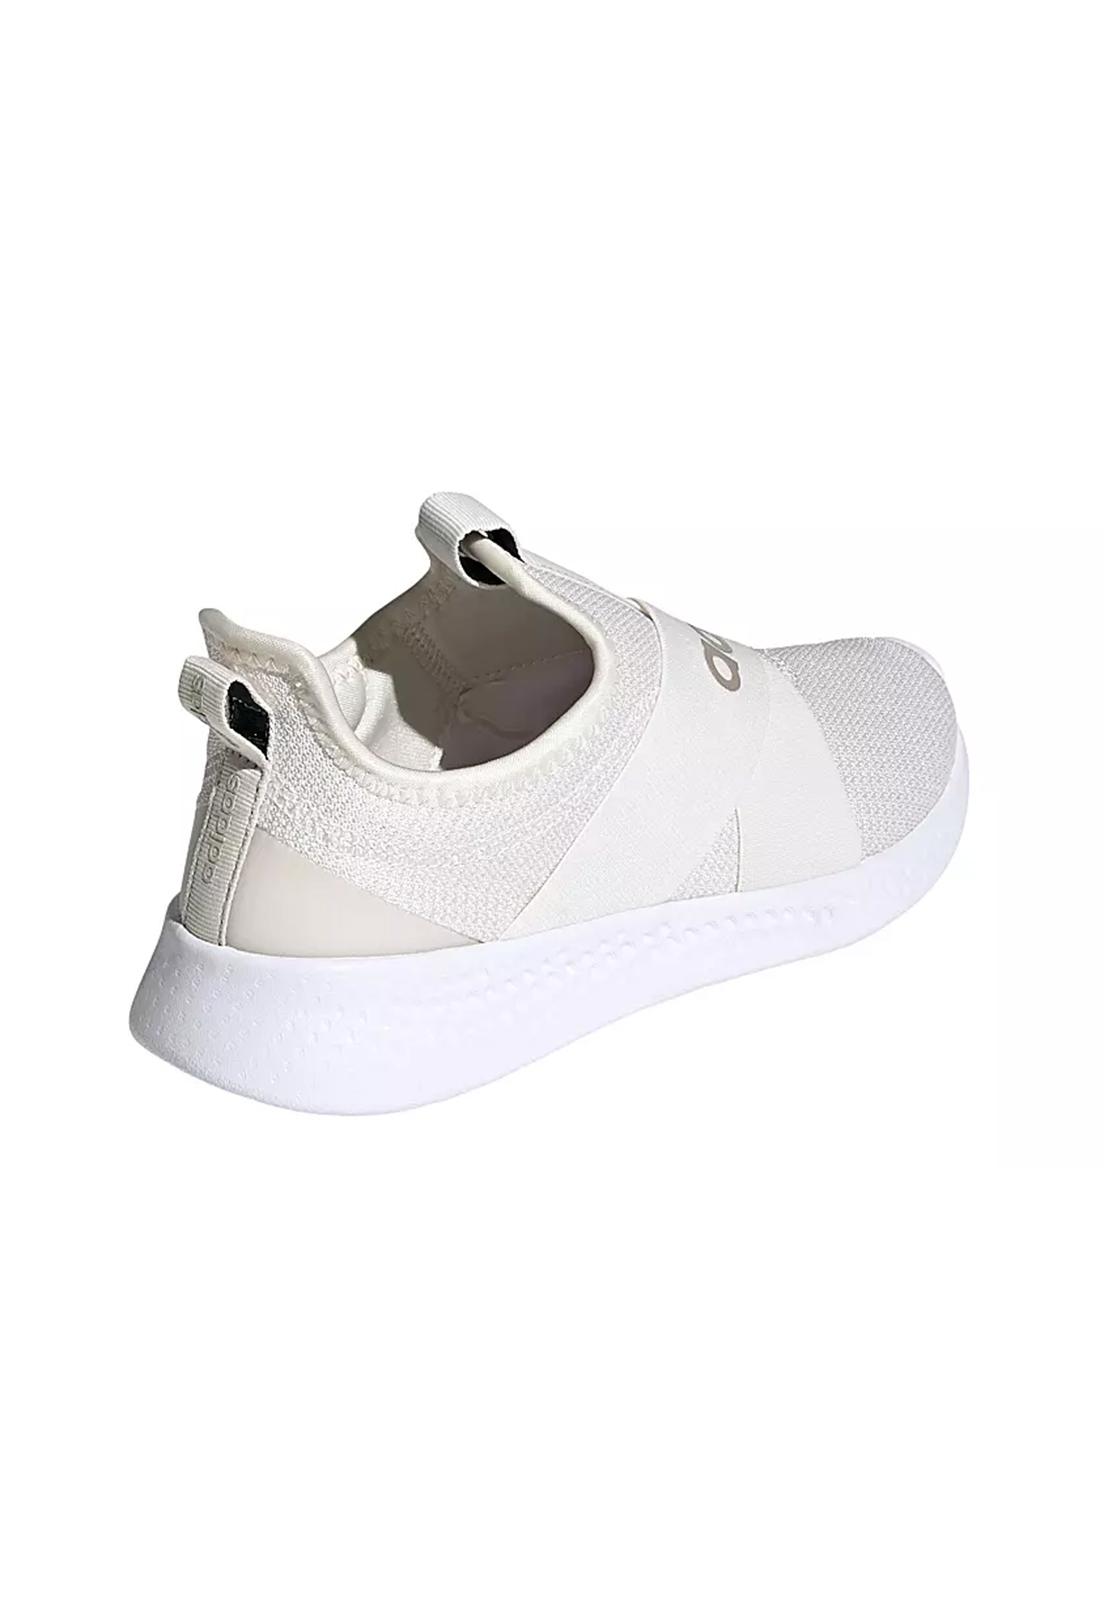 Tênis Adidas Puremotion Adapt Feminino - BEGE